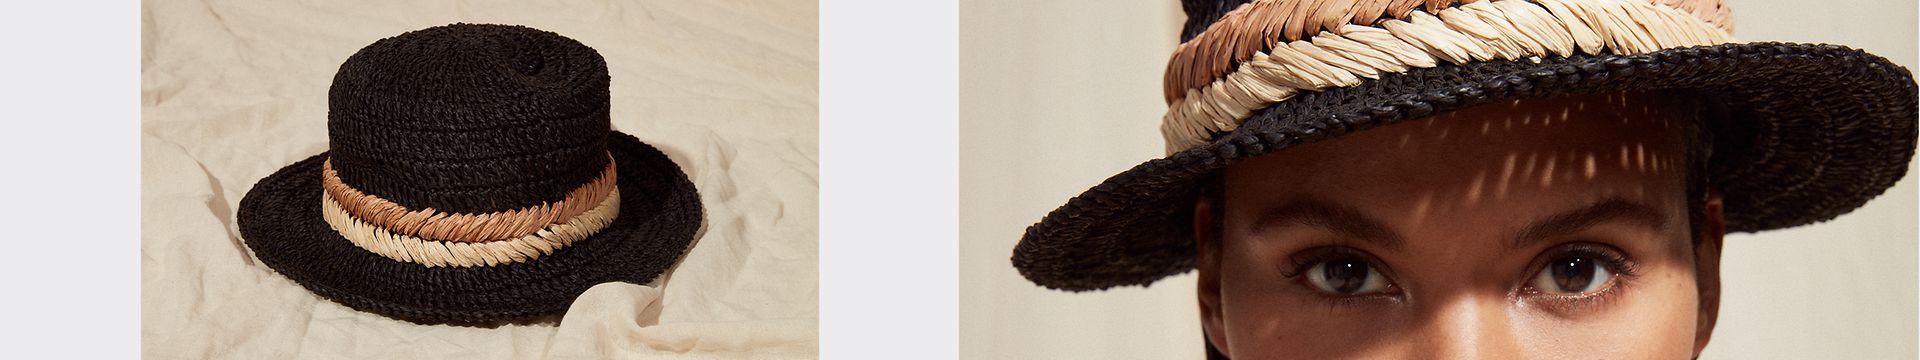 172021---woman---tc-banner---hats---IMG